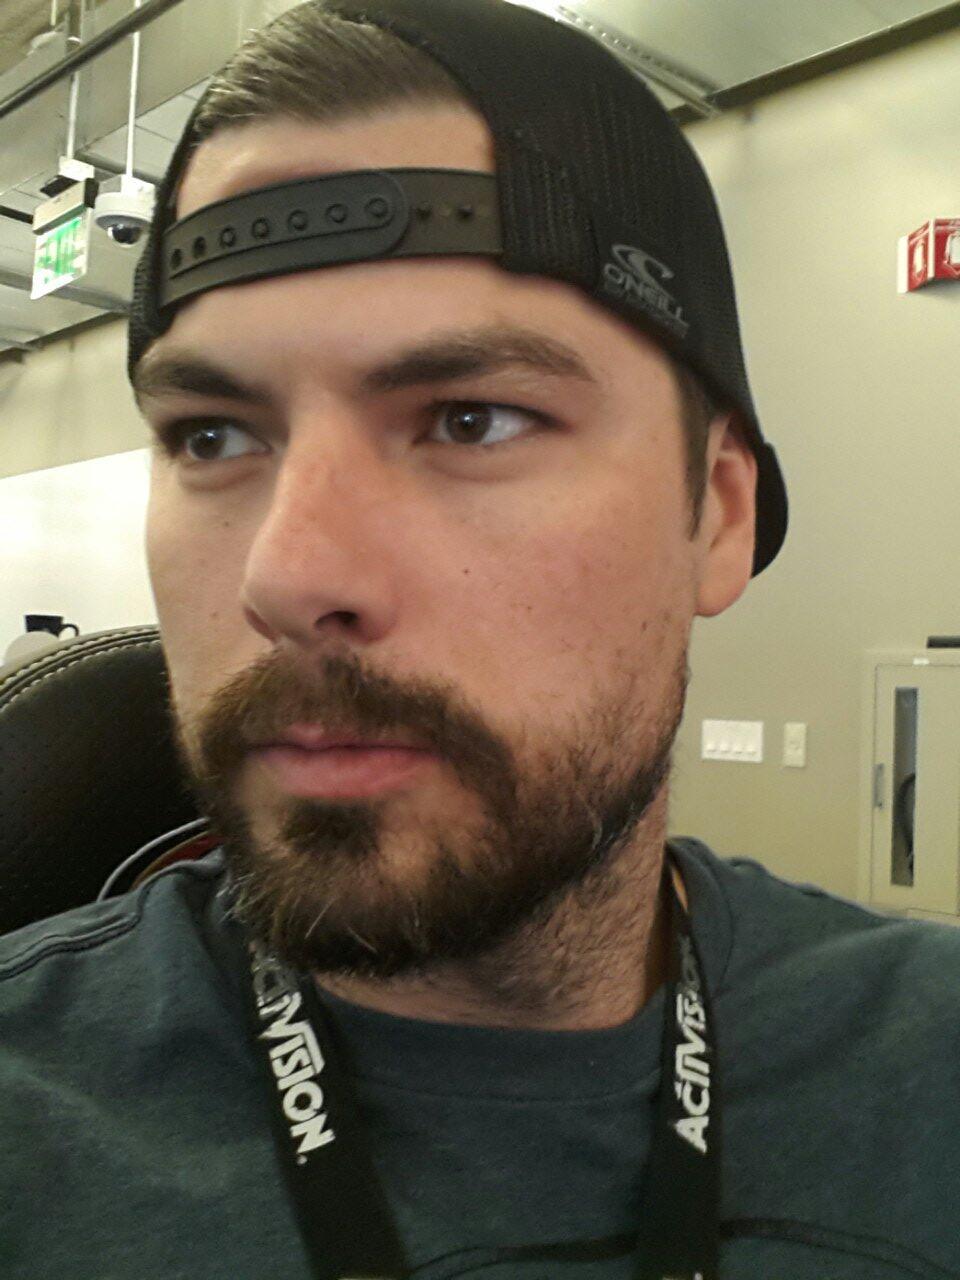 Guy Beahm On Twitter LaunchBeard Growing The Beard Out